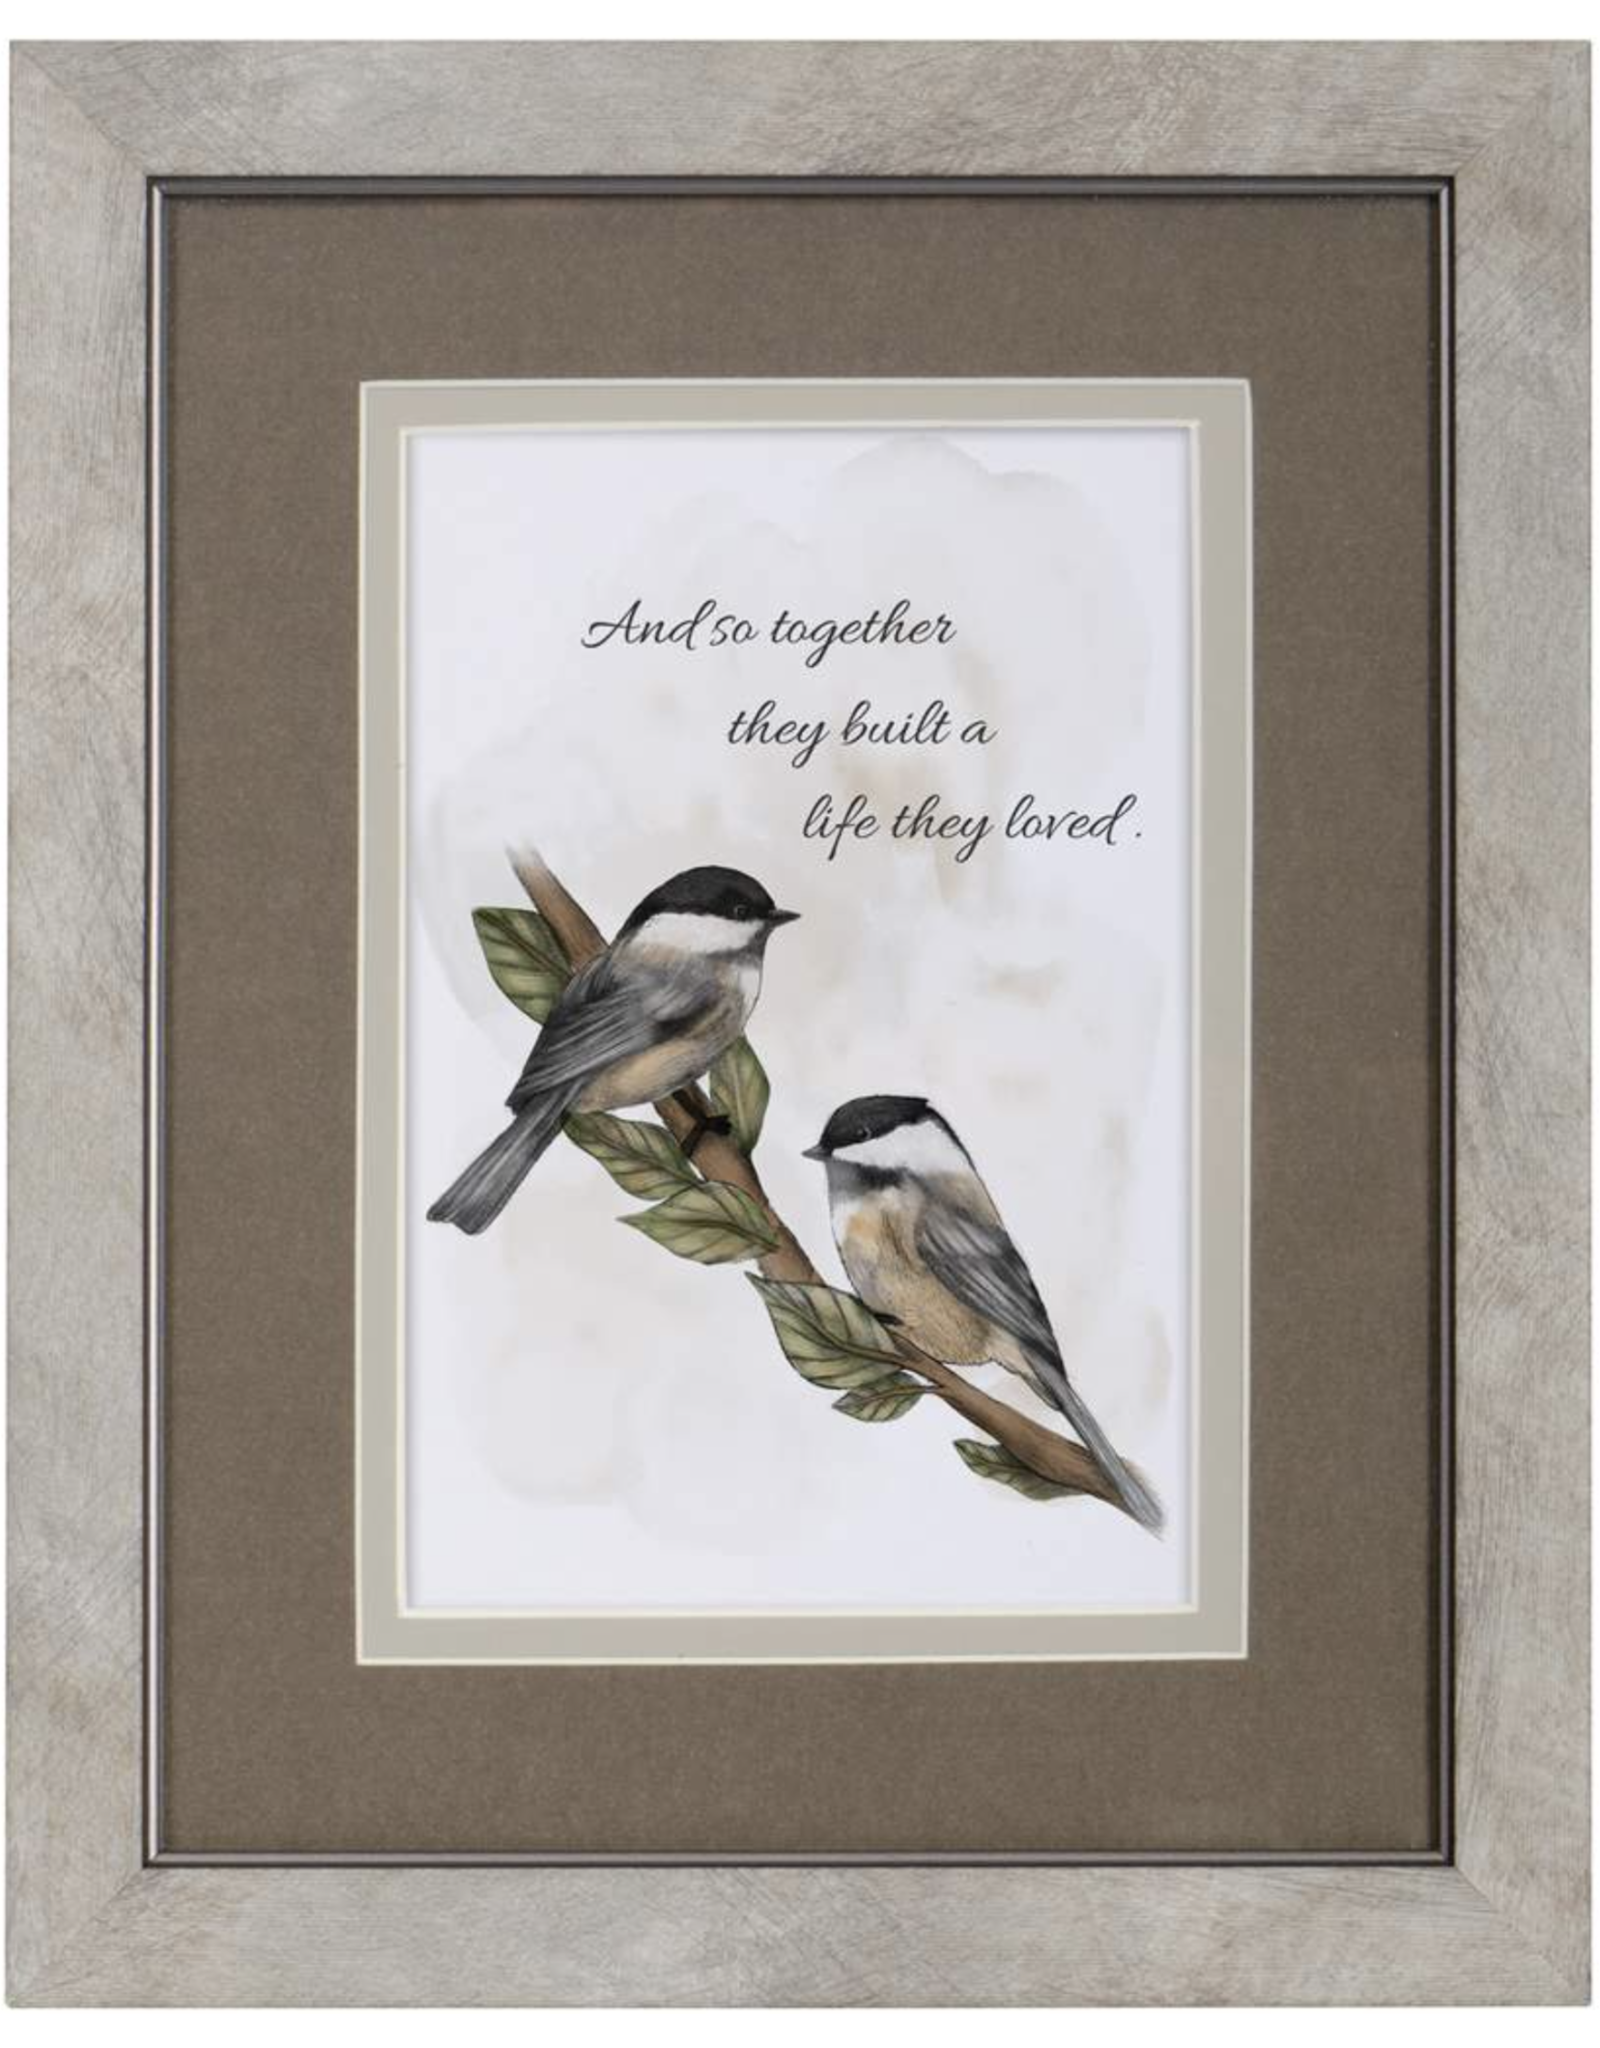 Carson EL23161 Framed Blessing - Chickadees Together